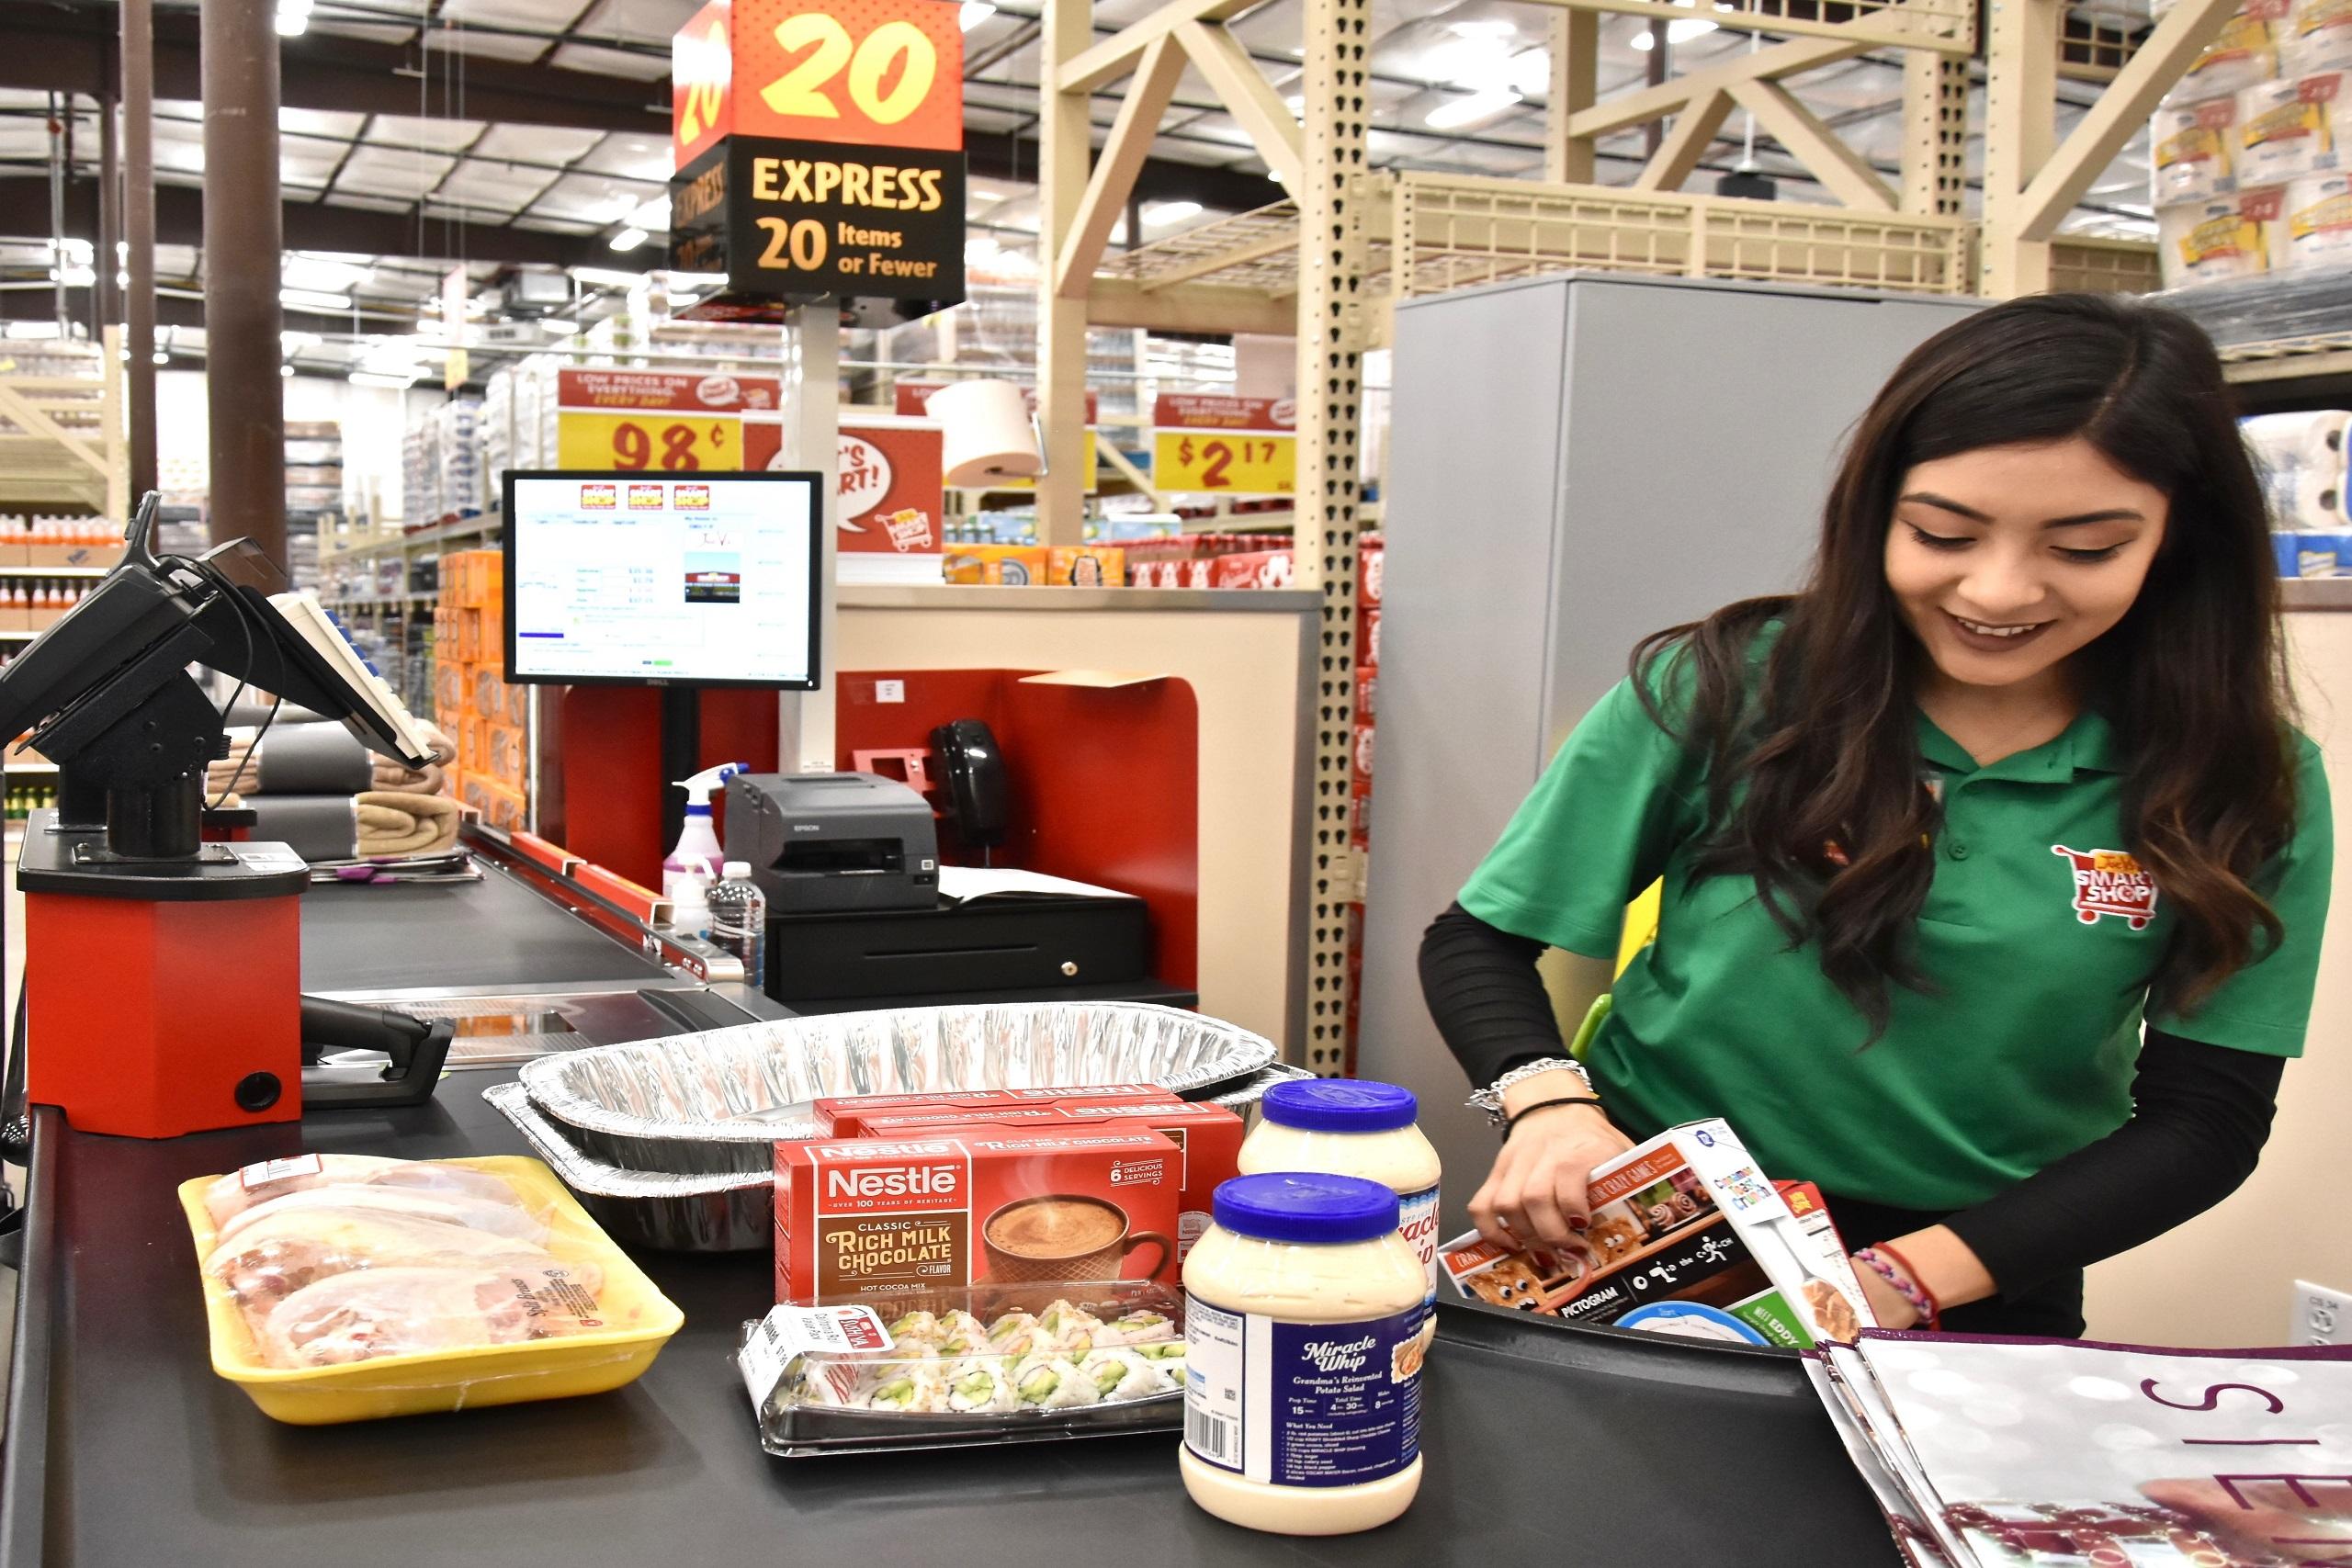 Joe V's Smart Shop and Mi Tienda make $100,000 gift - H-E-B Newsroom